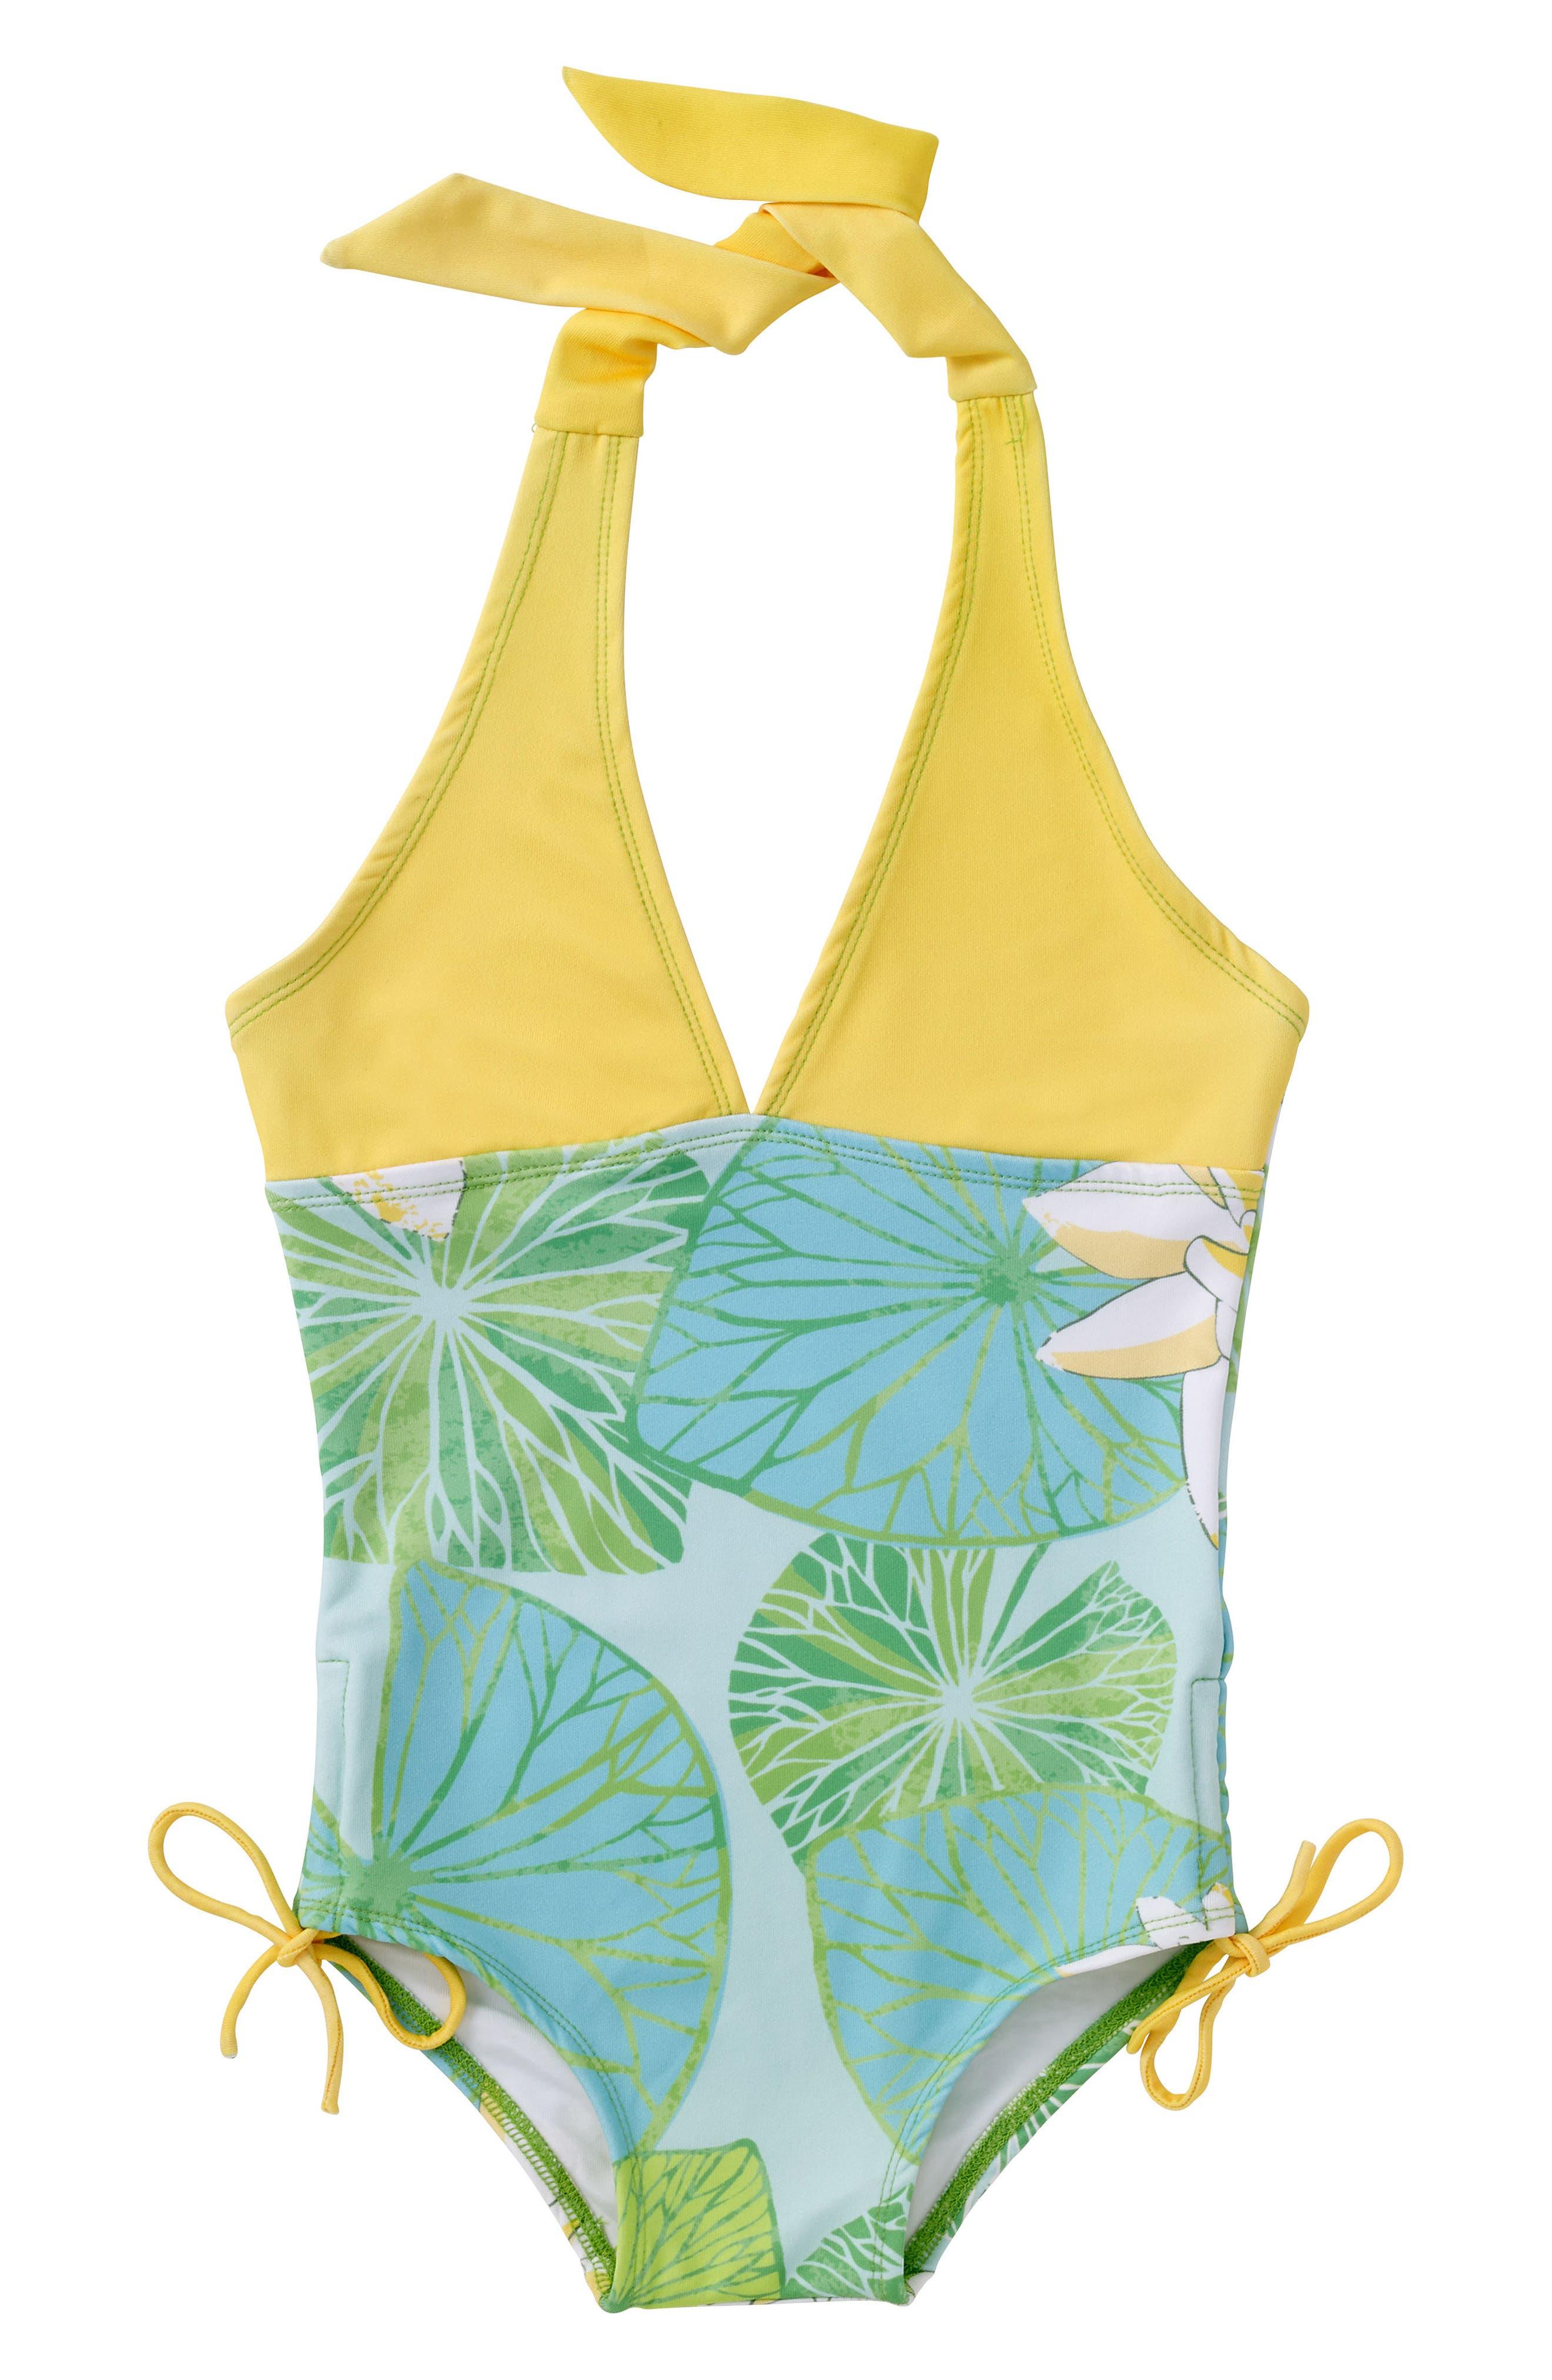 Alternate Image 1 Selected - Masala Baby One-Piece Halter Swimsuit (Toddler Girls, Little Girls & Big Girls)